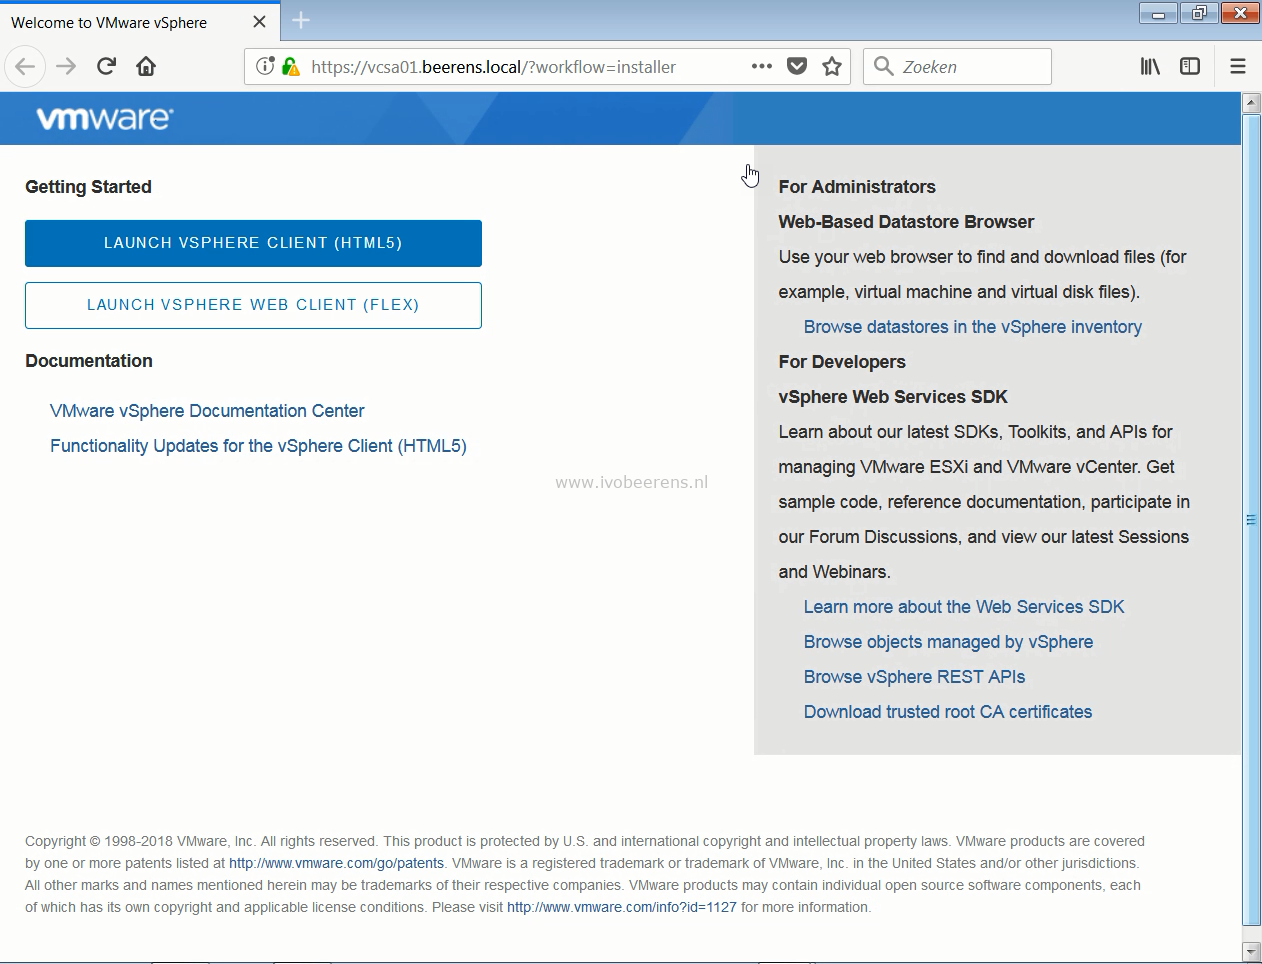 Upgrading a vCenter Server Appliance (VCSA) to version 6 7